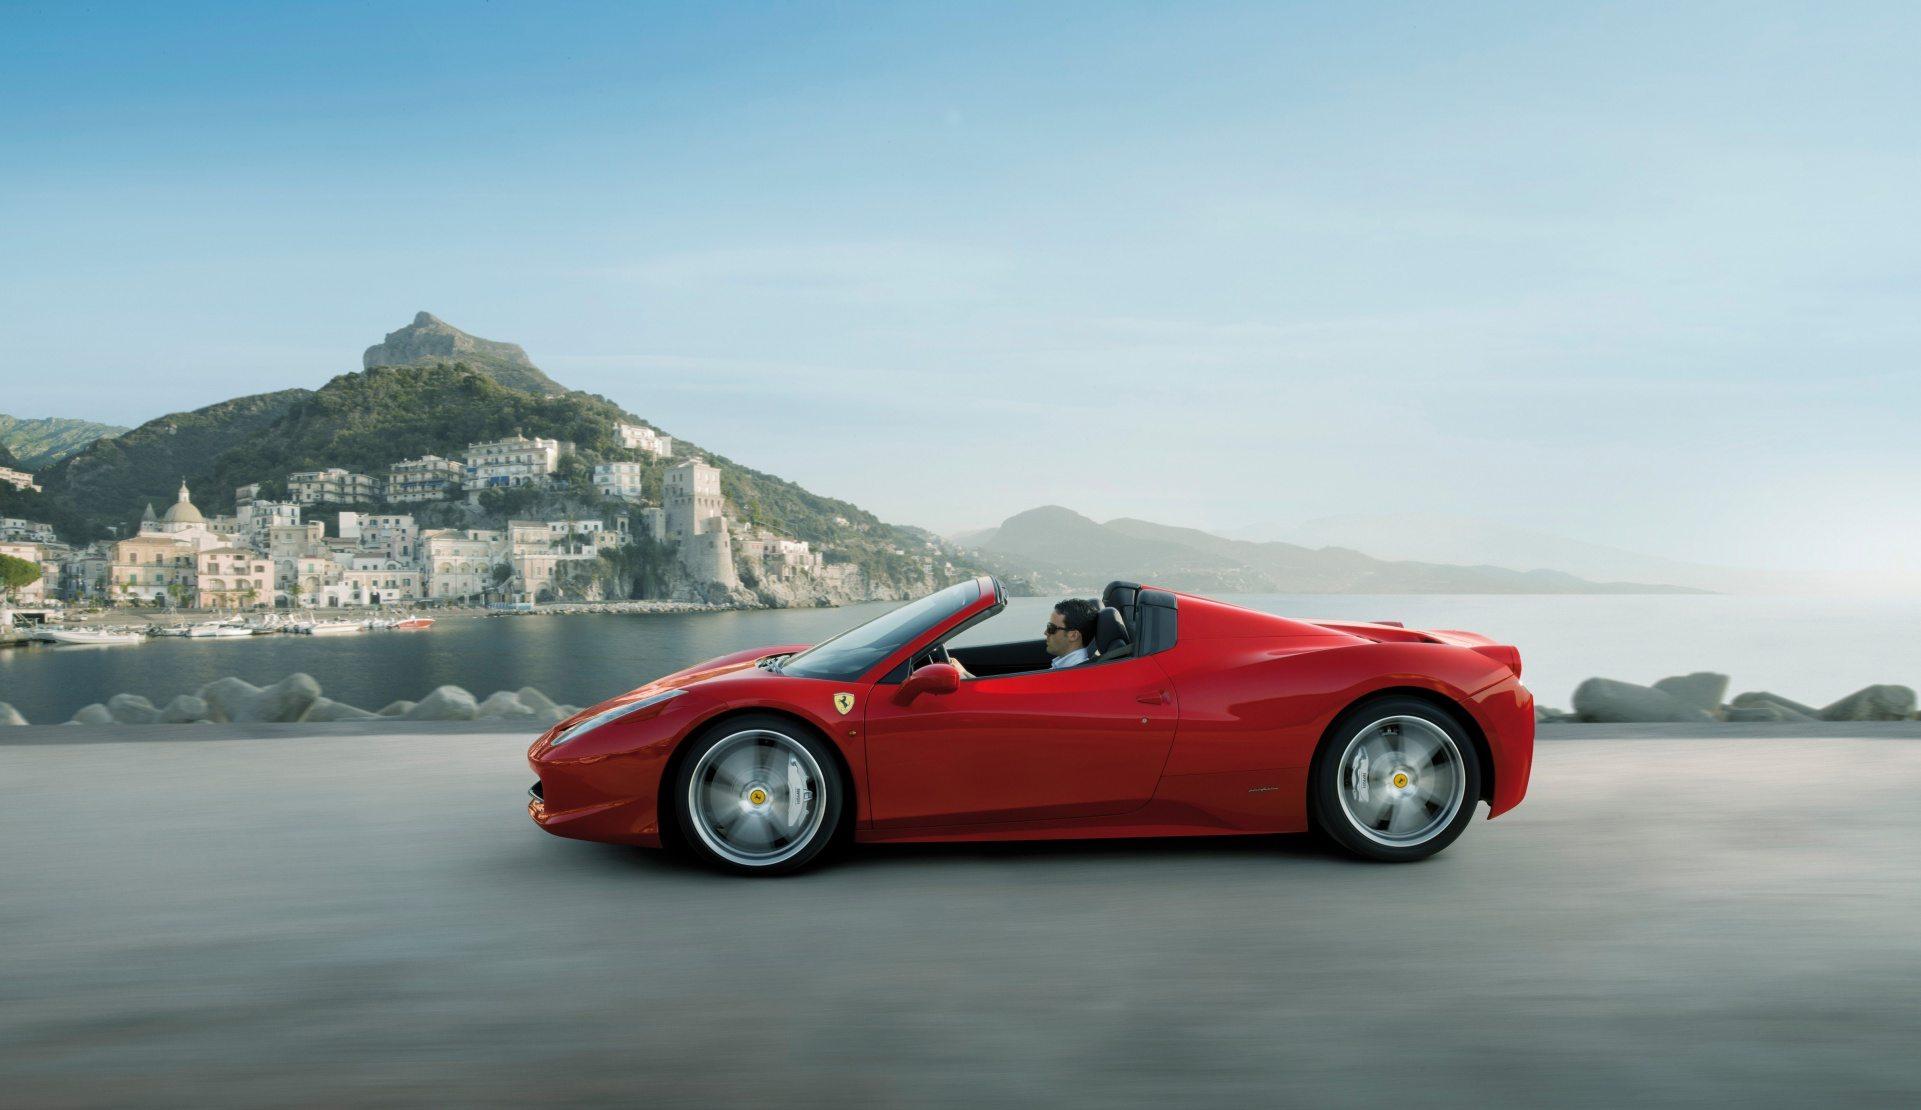 Ferrari 458 Italia Desktop Wallpaper   HD 1921x1110